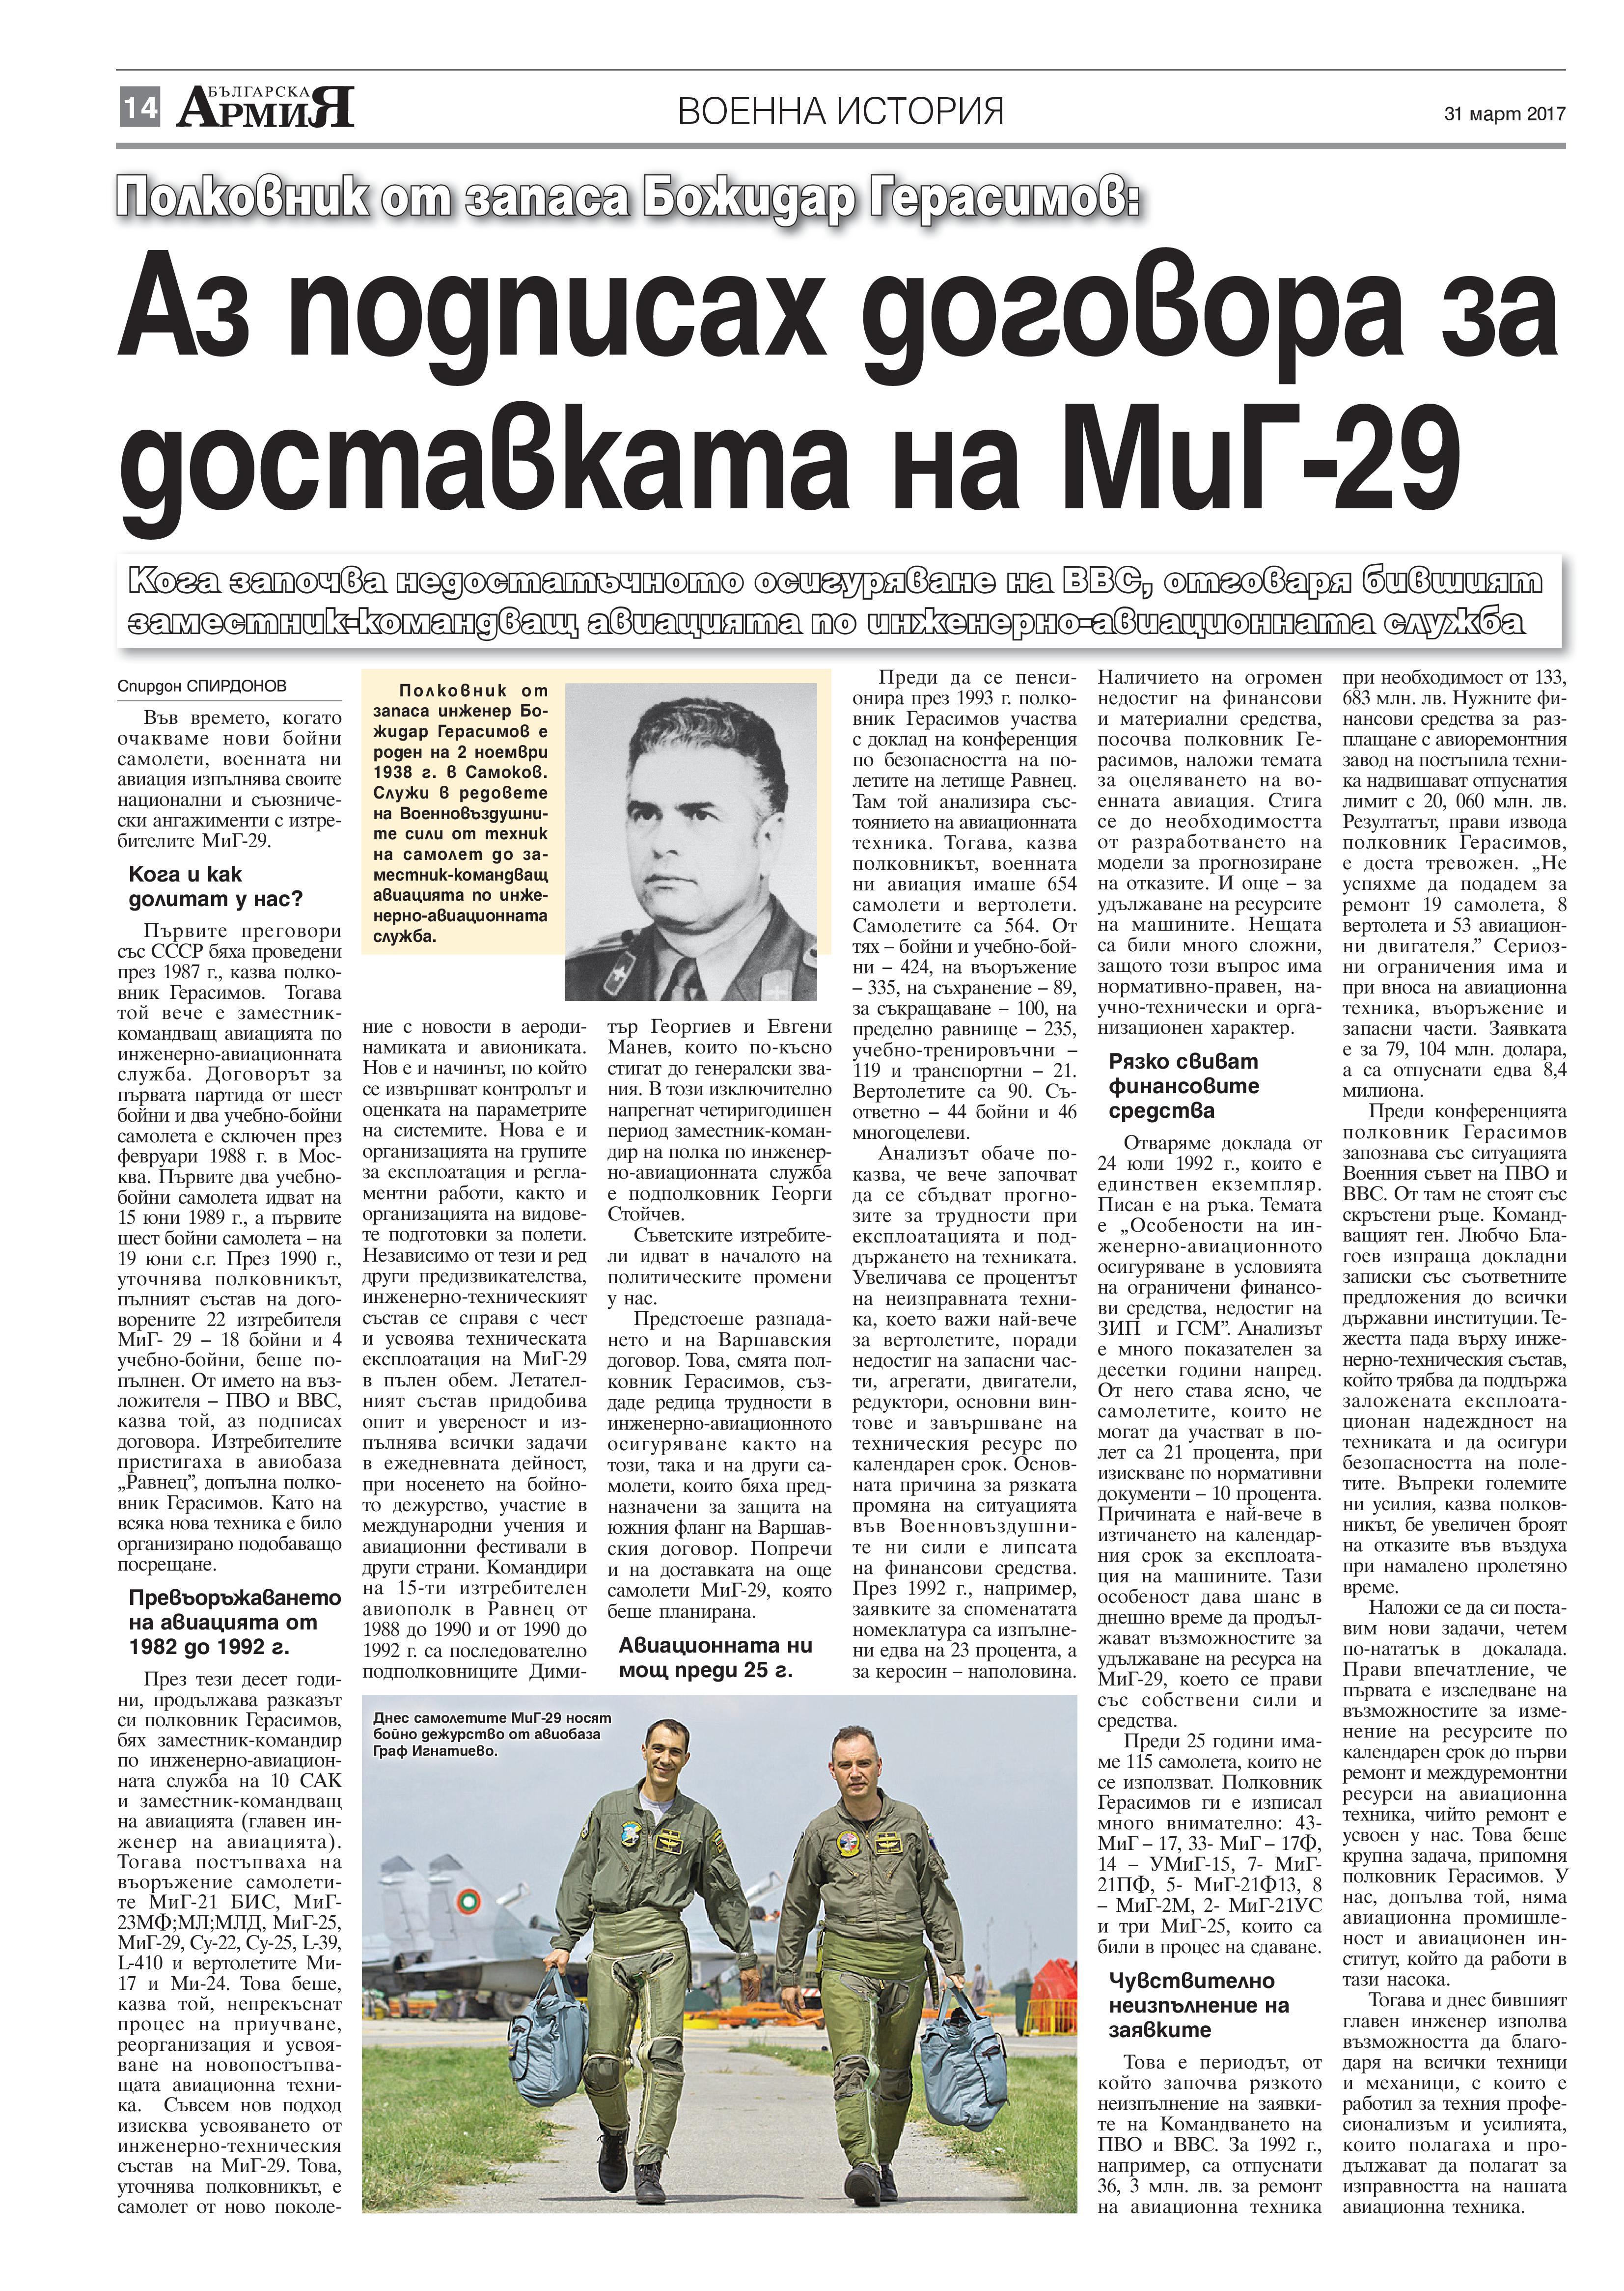 https://www.armymedia.bg/wp-content/uploads/2017/03/14-1.jpg